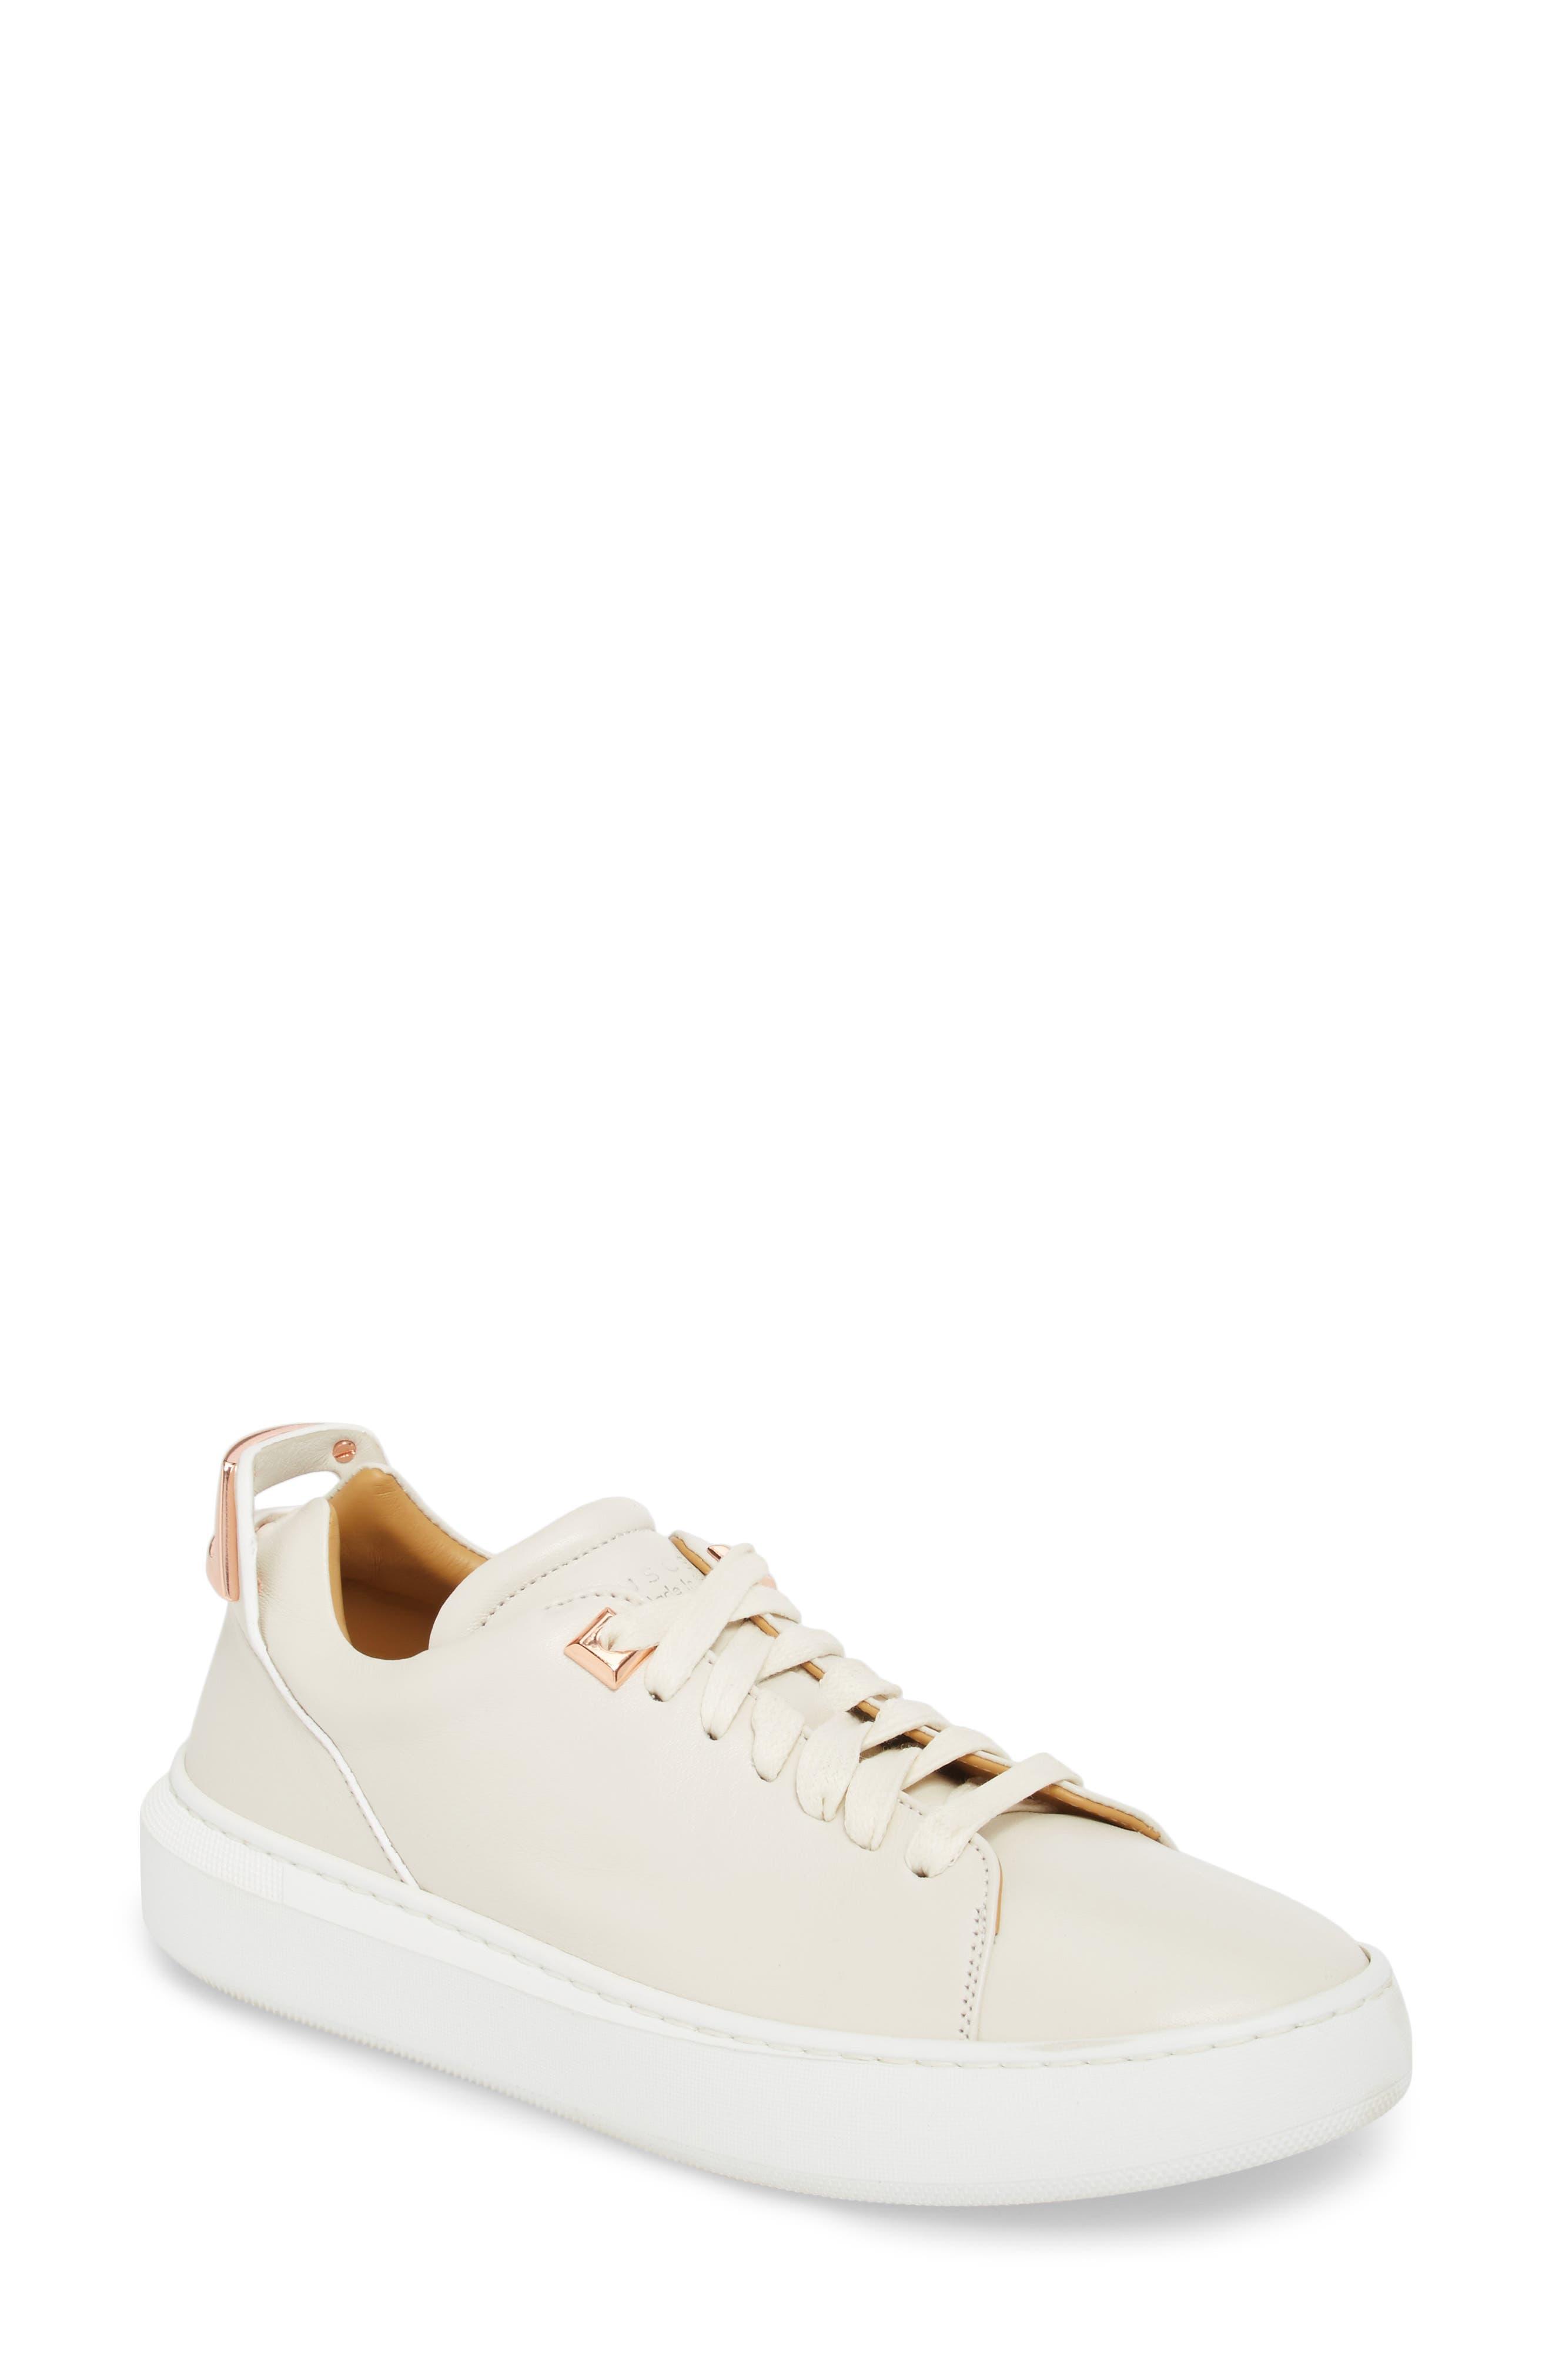 Uno Low Top Sneaker,                             Main thumbnail 2, color,